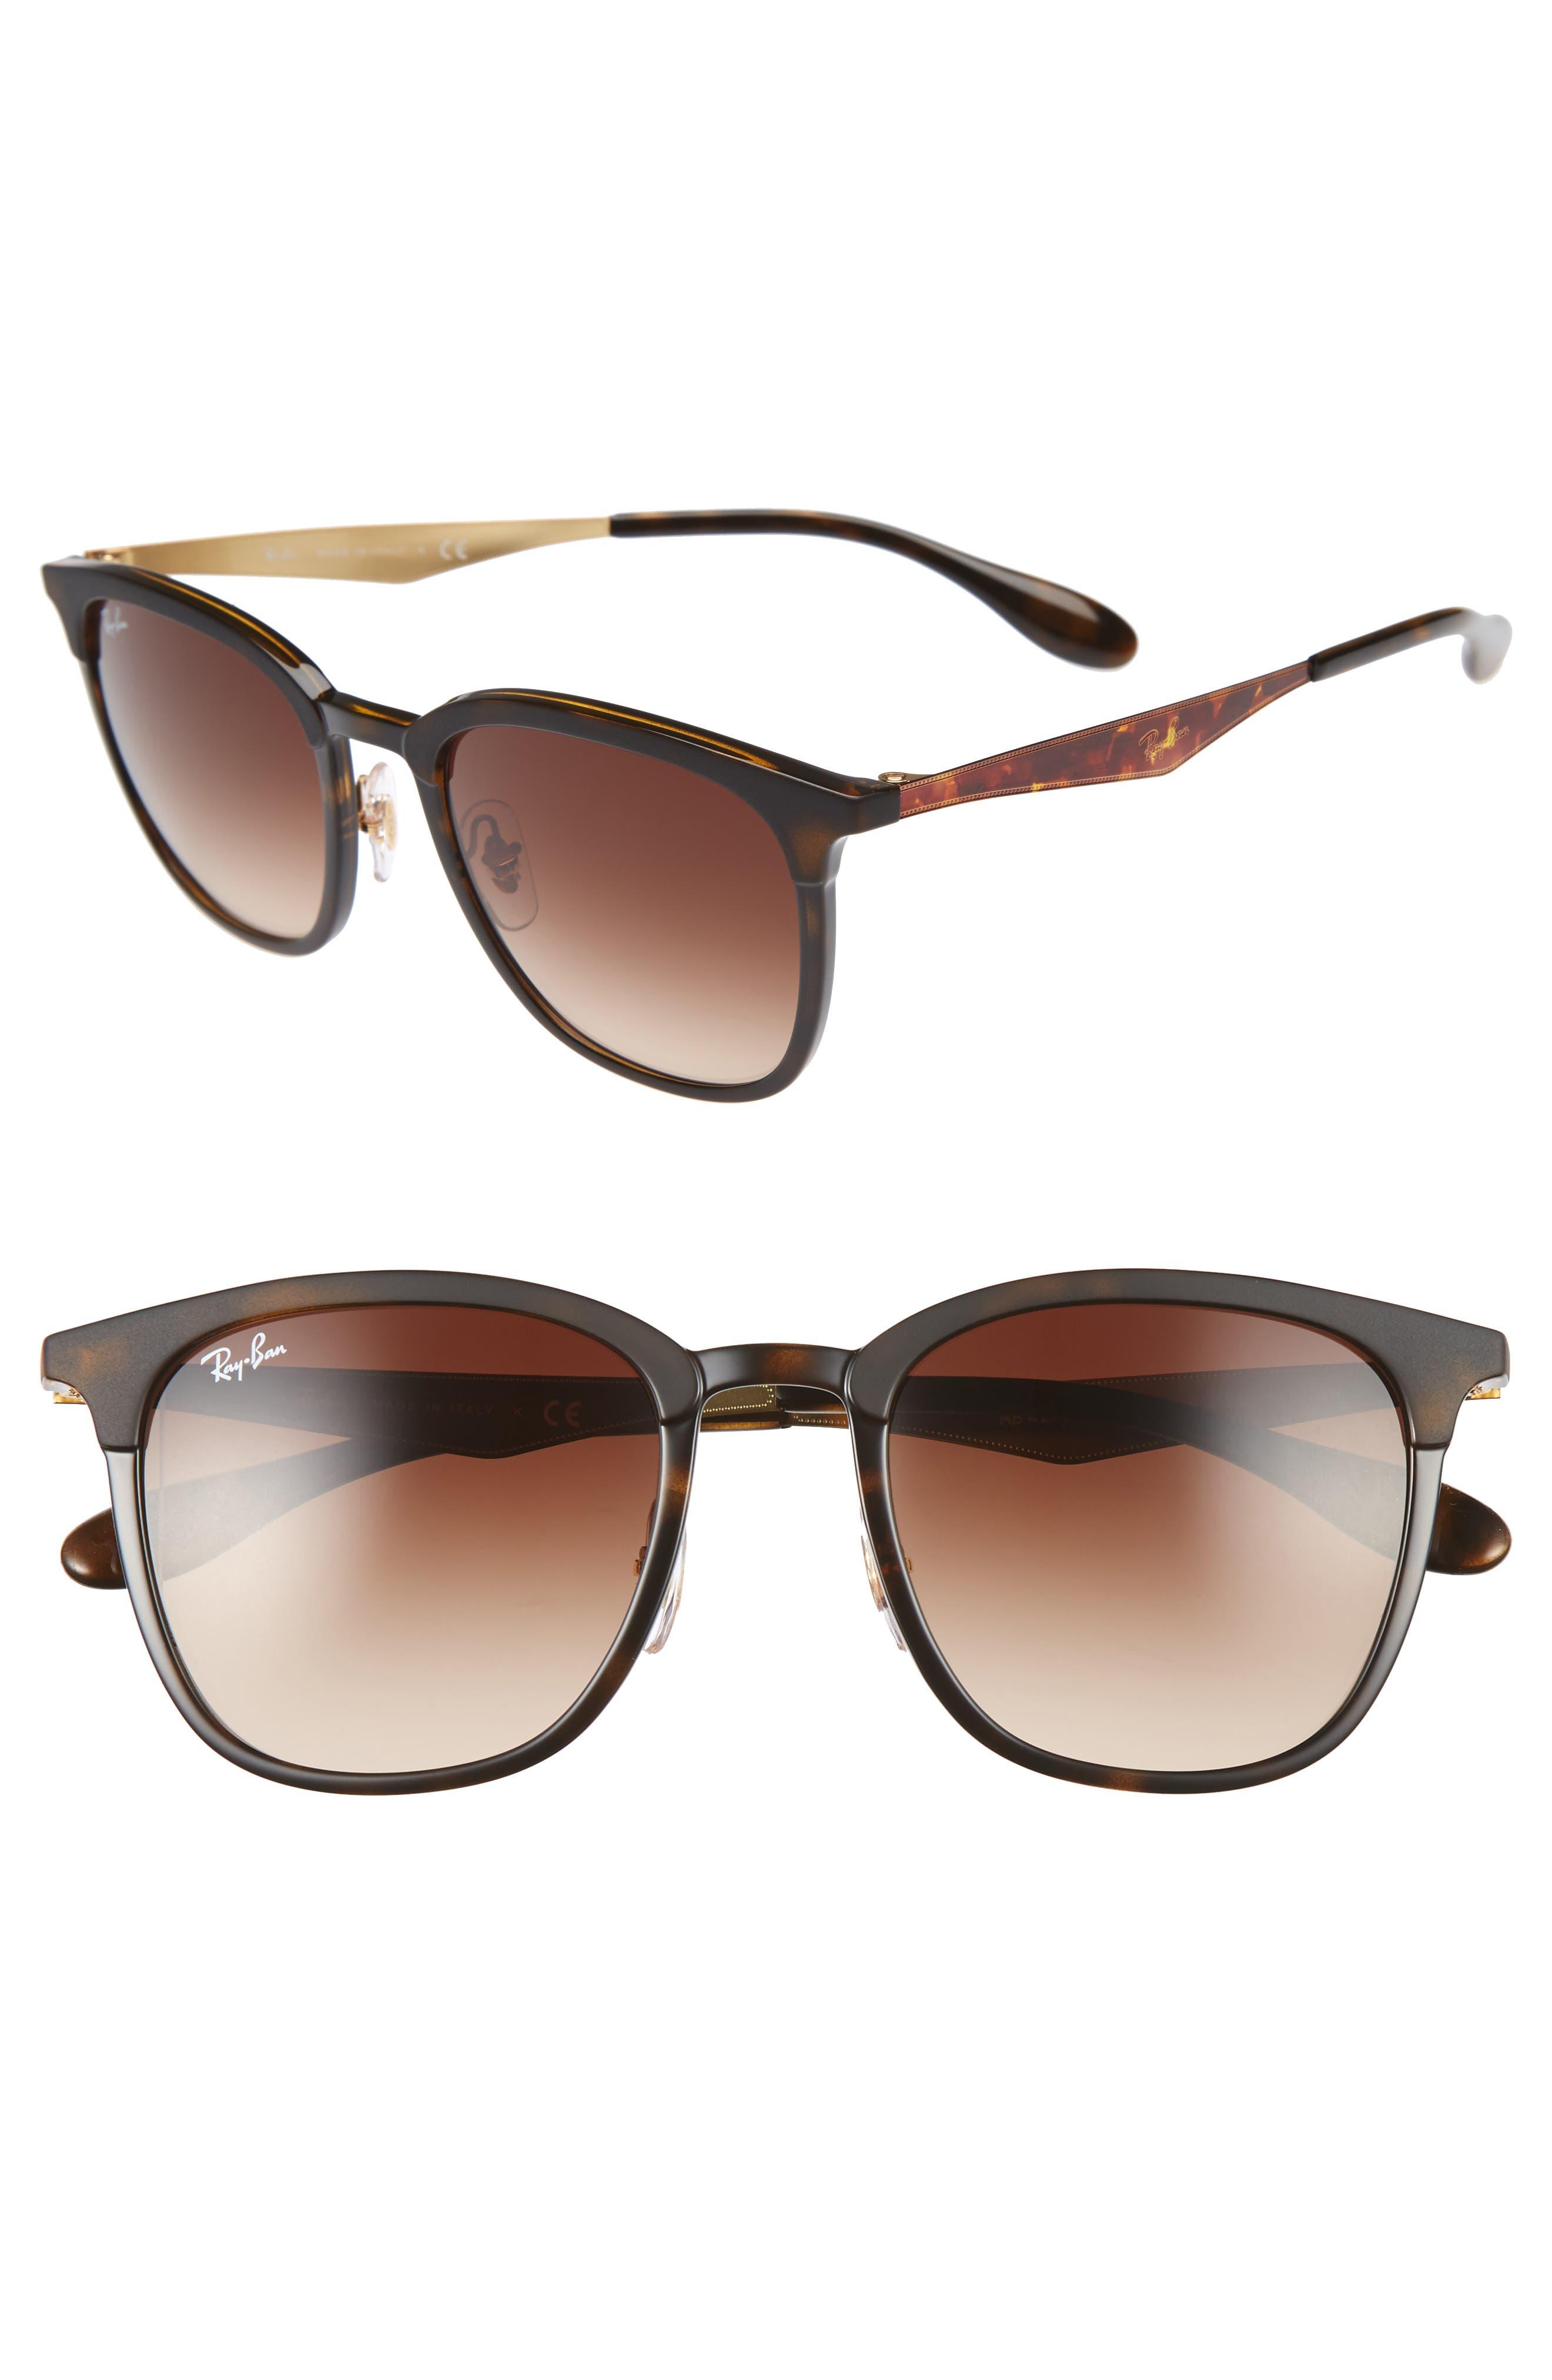 Ray-Ban Highstreet 51mm Square Sunglasses